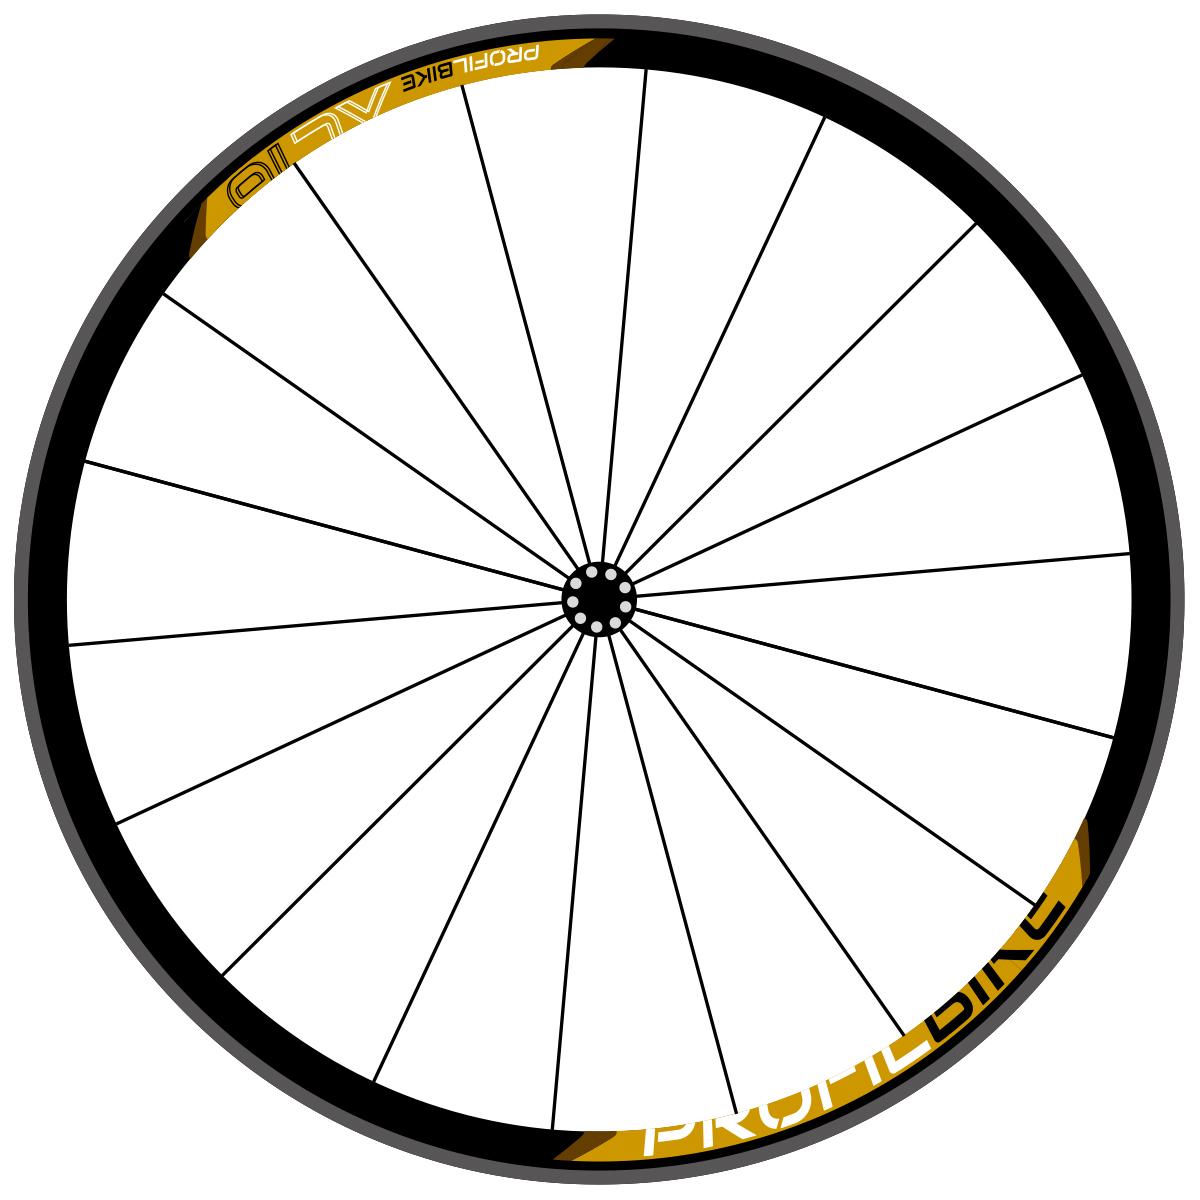 Profilbike XC16 design or